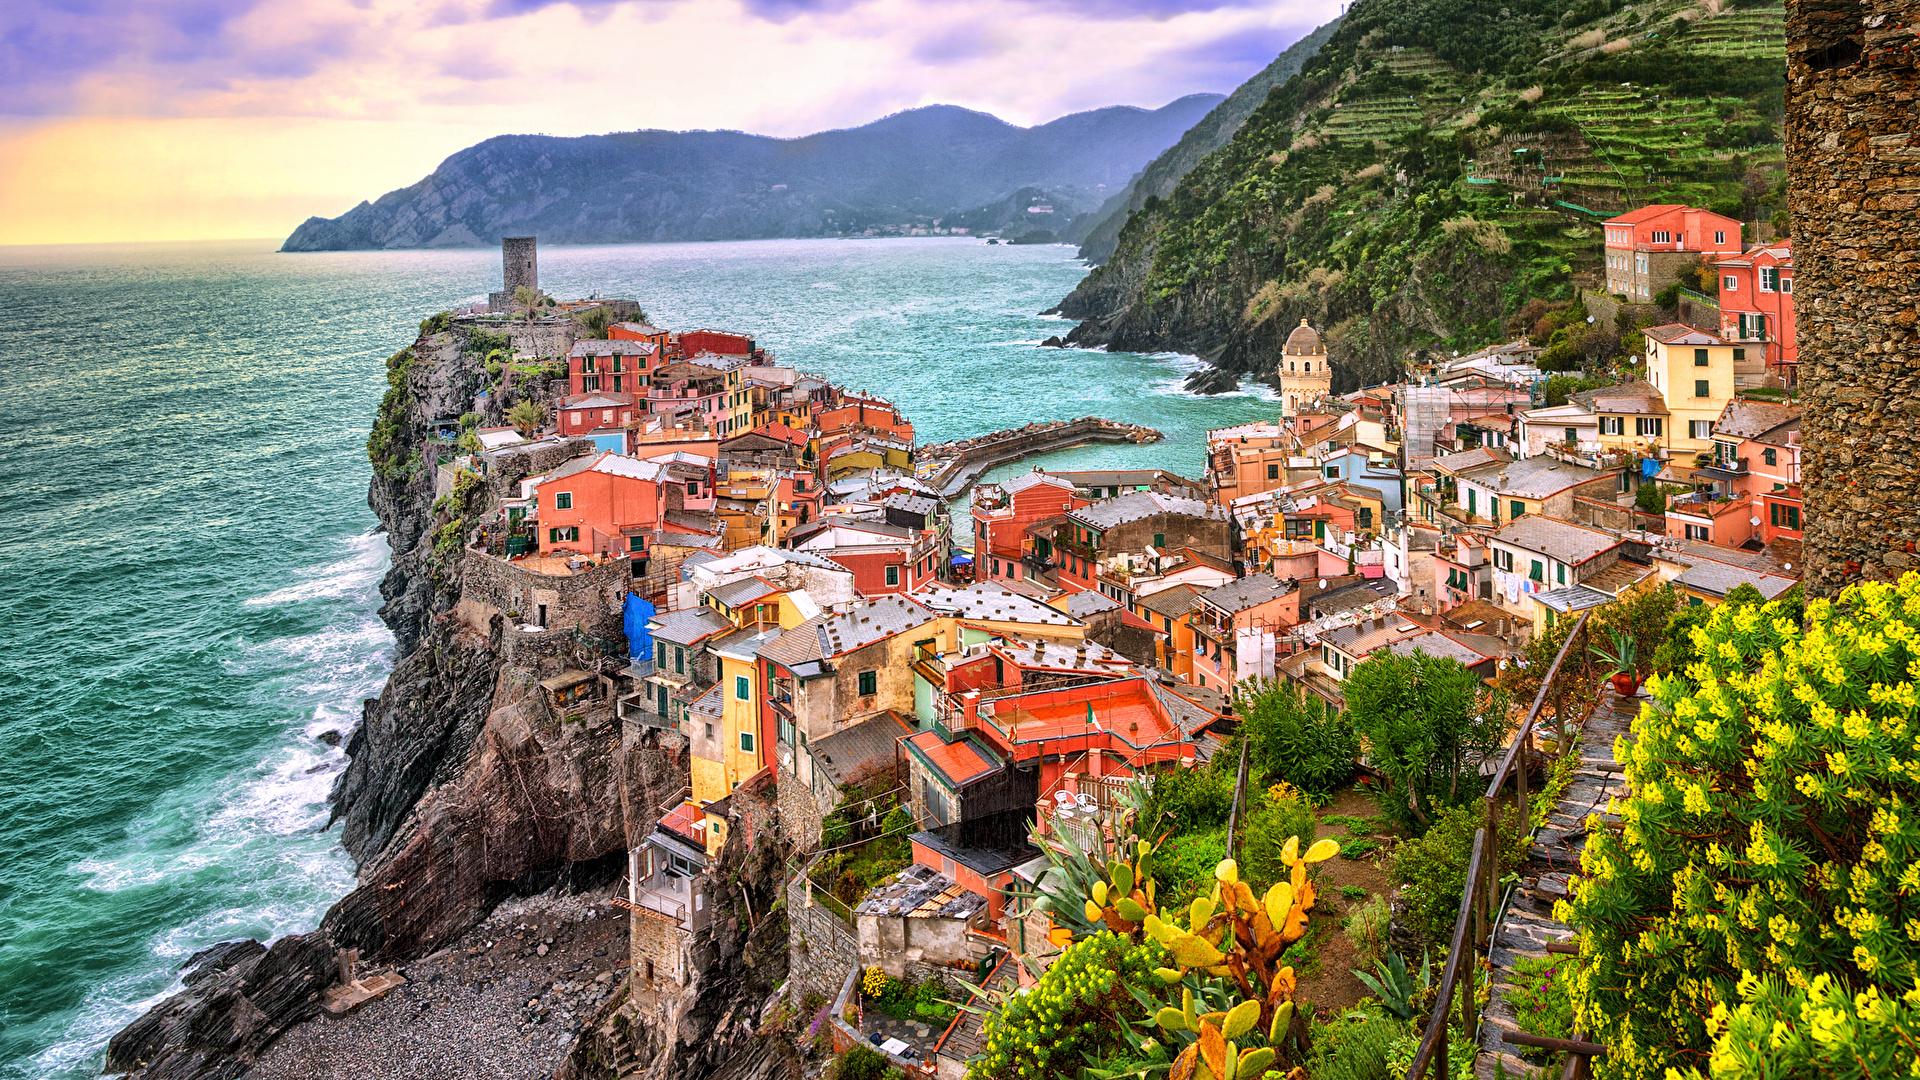 Image Liguria Vernazza Cinque Terre park Italy Cliff Bay 1920x1080 1920x1080